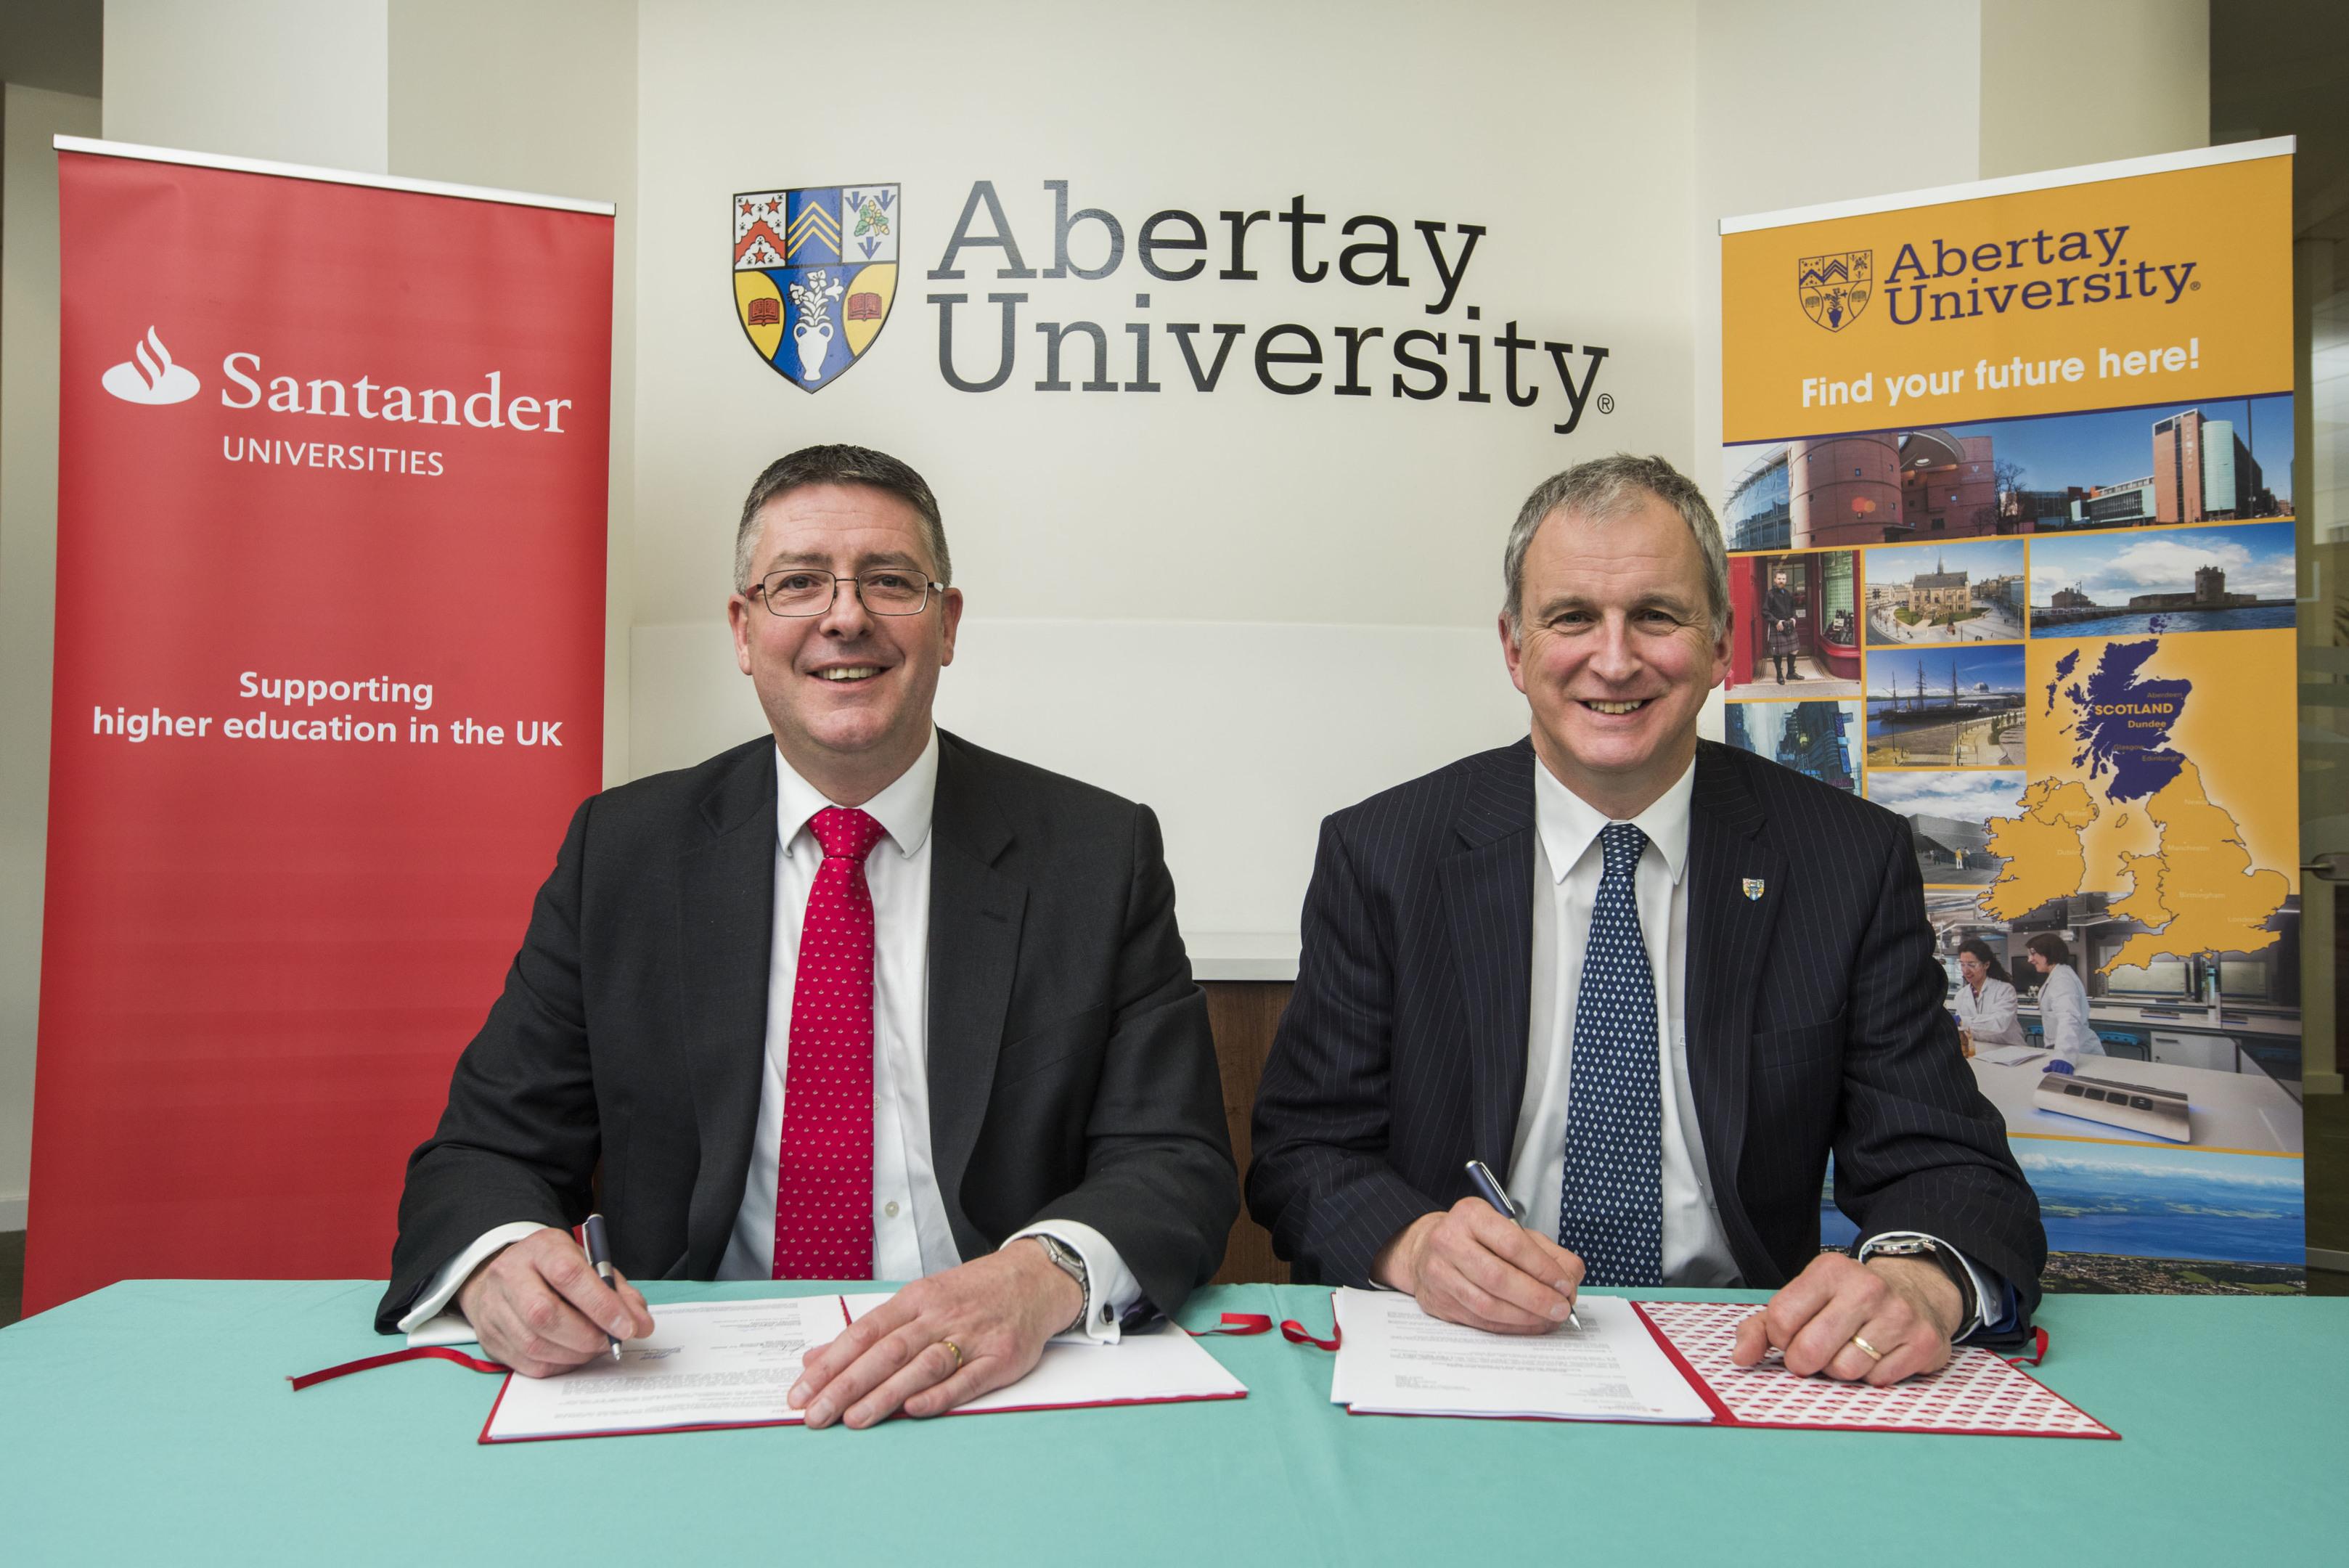 Matt Hutnell, director of Santander Universities UK, and Principal of Abertay   Professor Nigel Seaton sign the agreement.